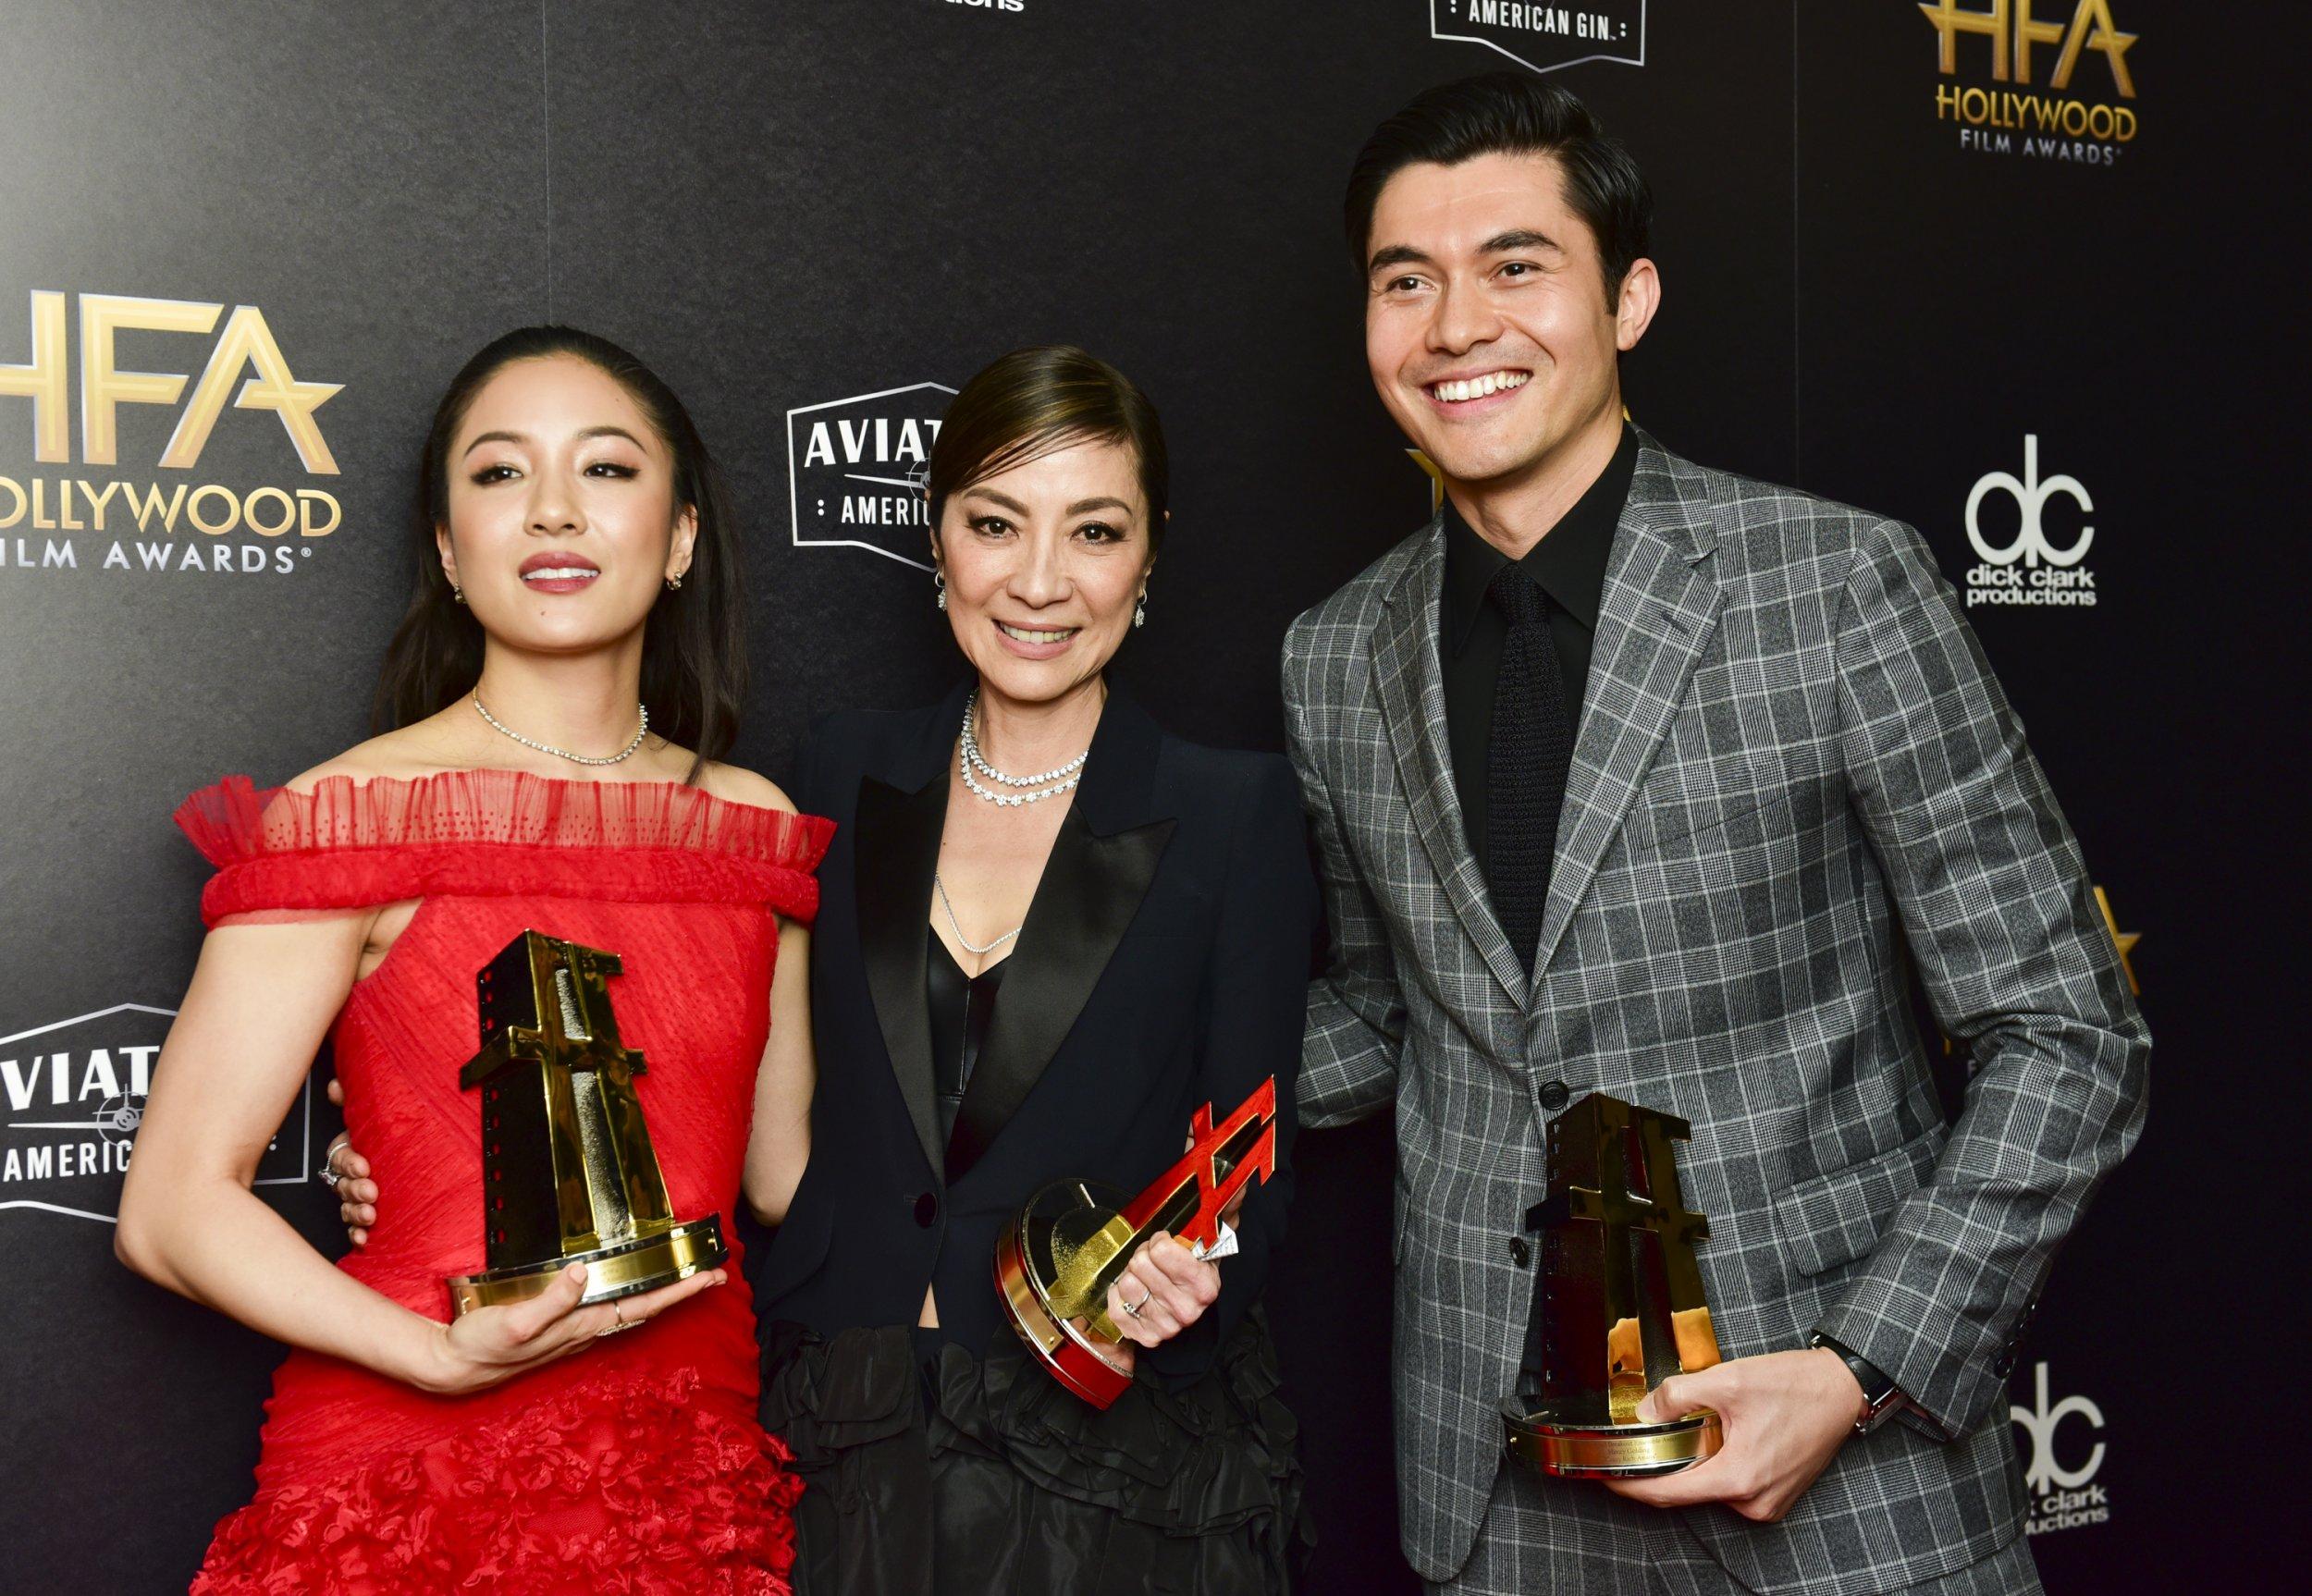 Constance Wu, Golden Globes, Crazy Rich Asians, Best Actress, Hollywood 2